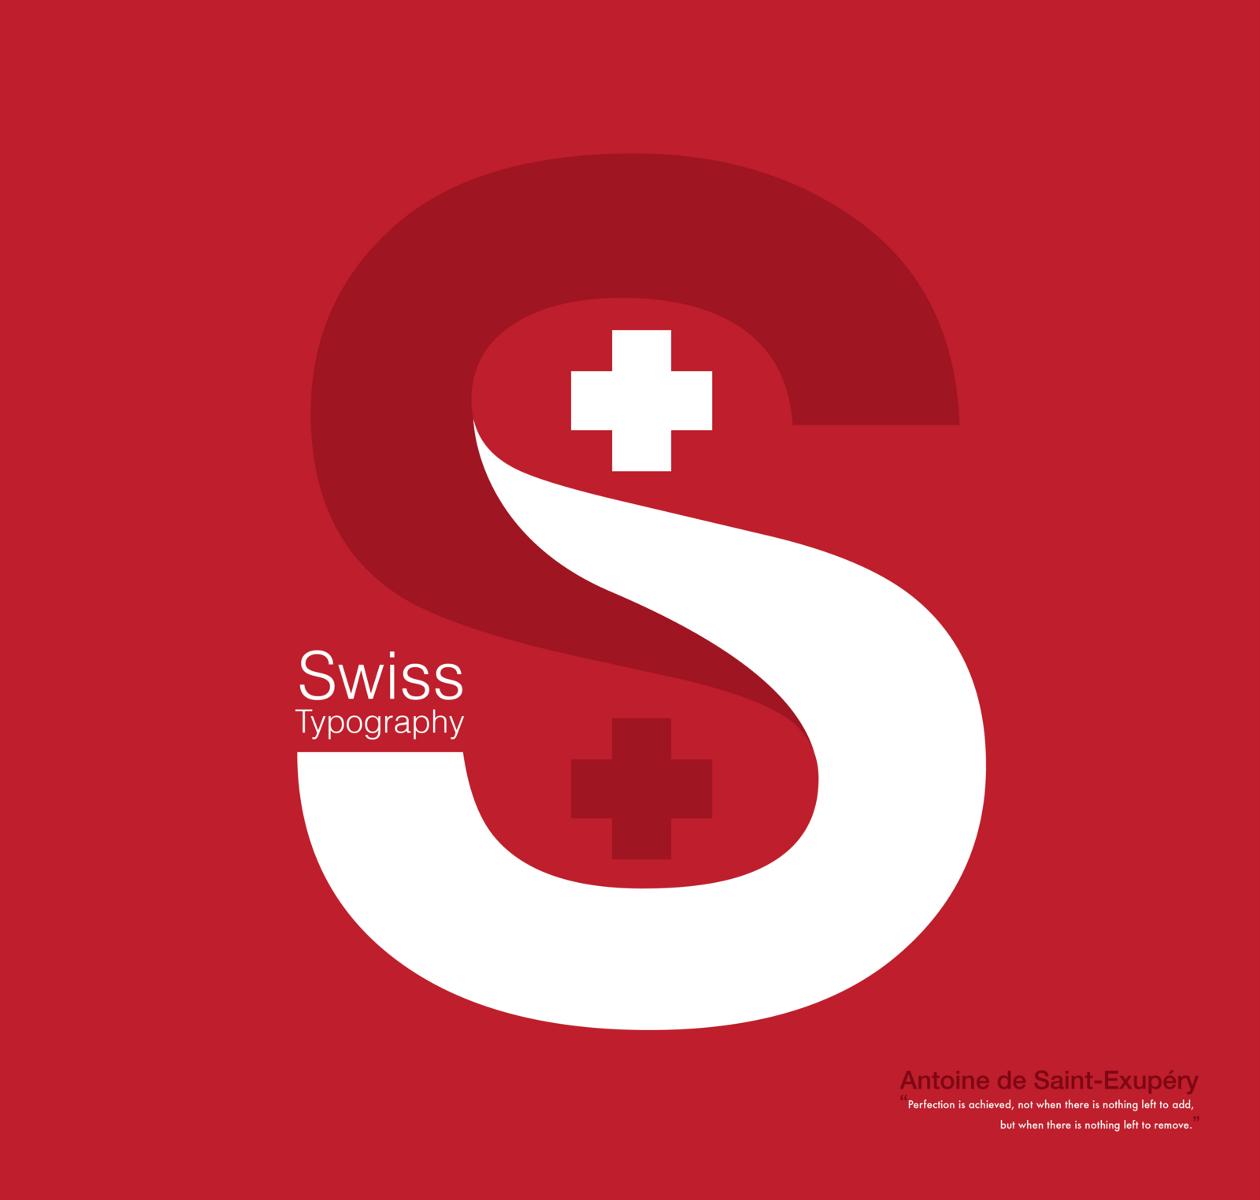 flat-design-swiss-style-international-typographic-style